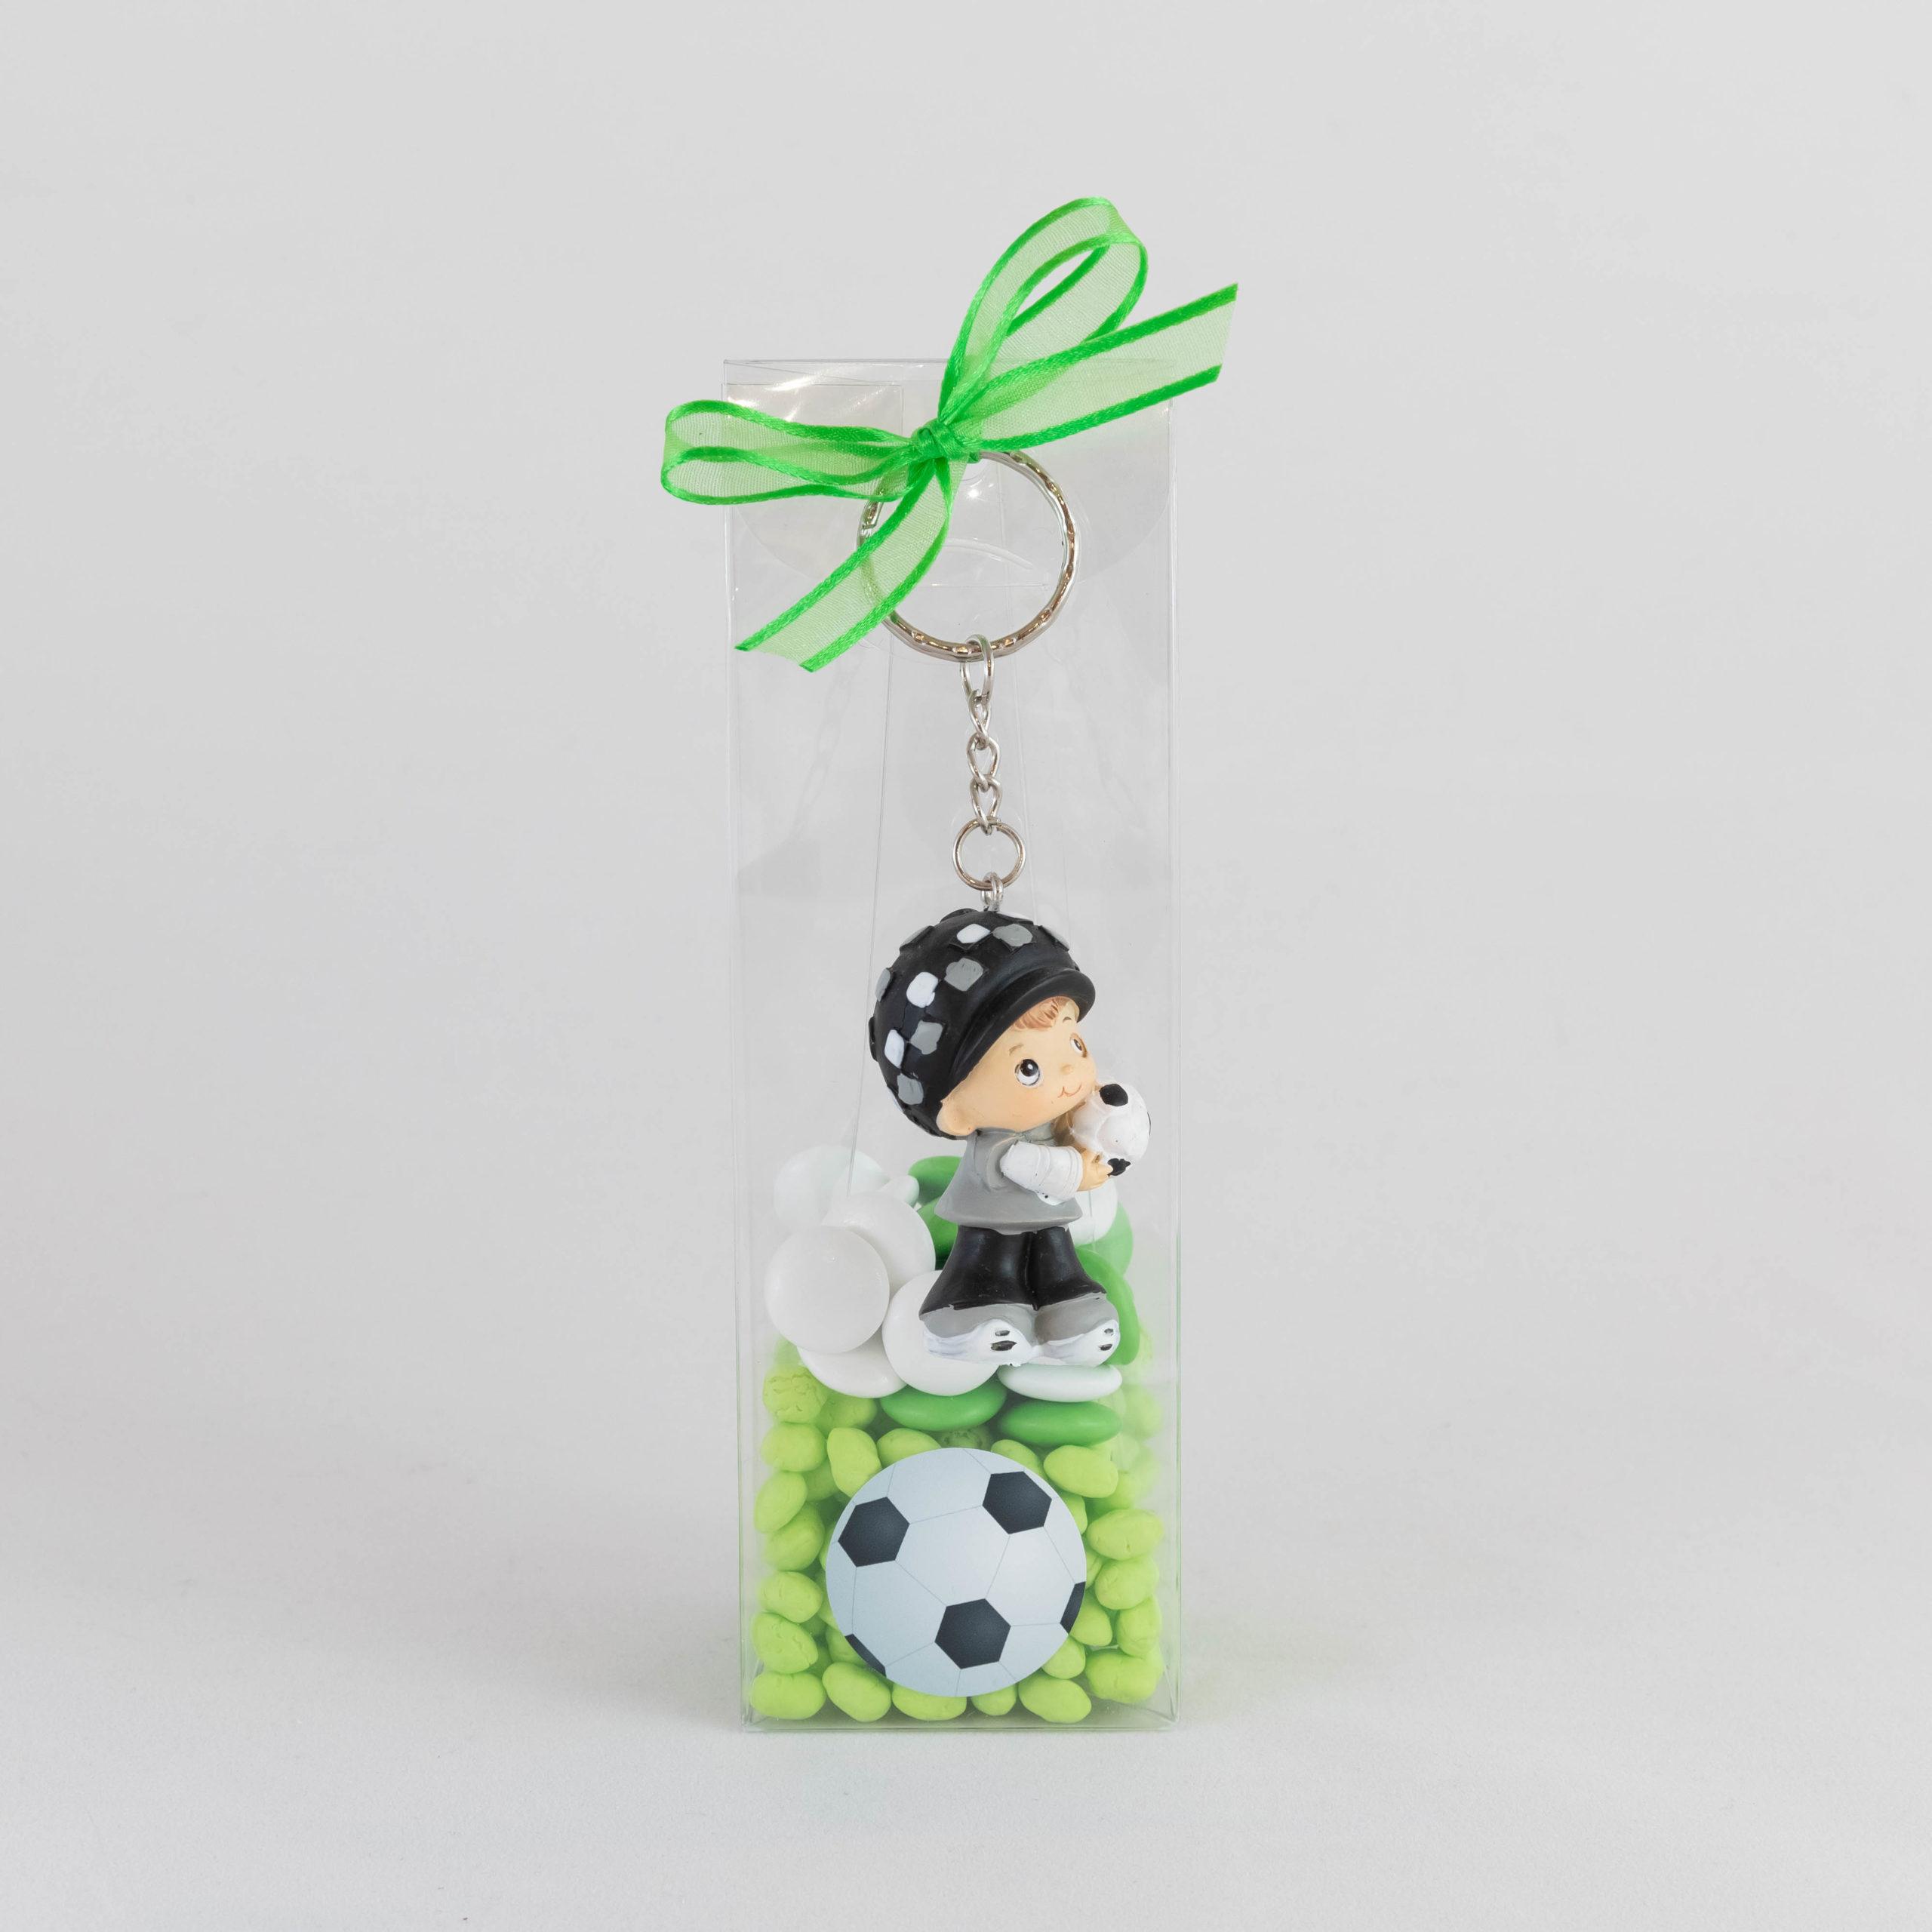 Boite footballeur - Foot Image